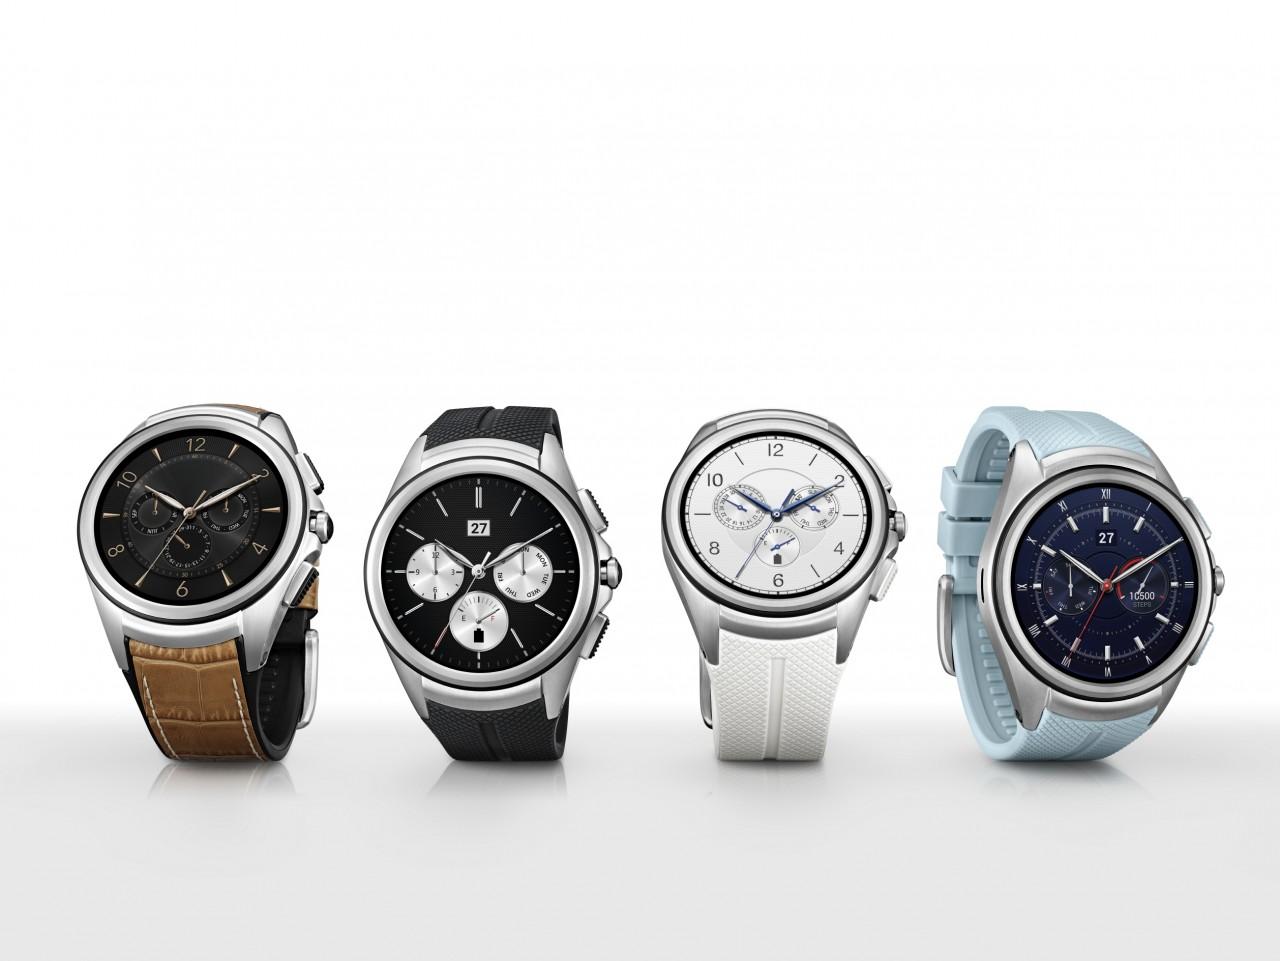 LG Watch Urbane 2nd Edition è il primo smartwatch Android Wear con SIM (video)